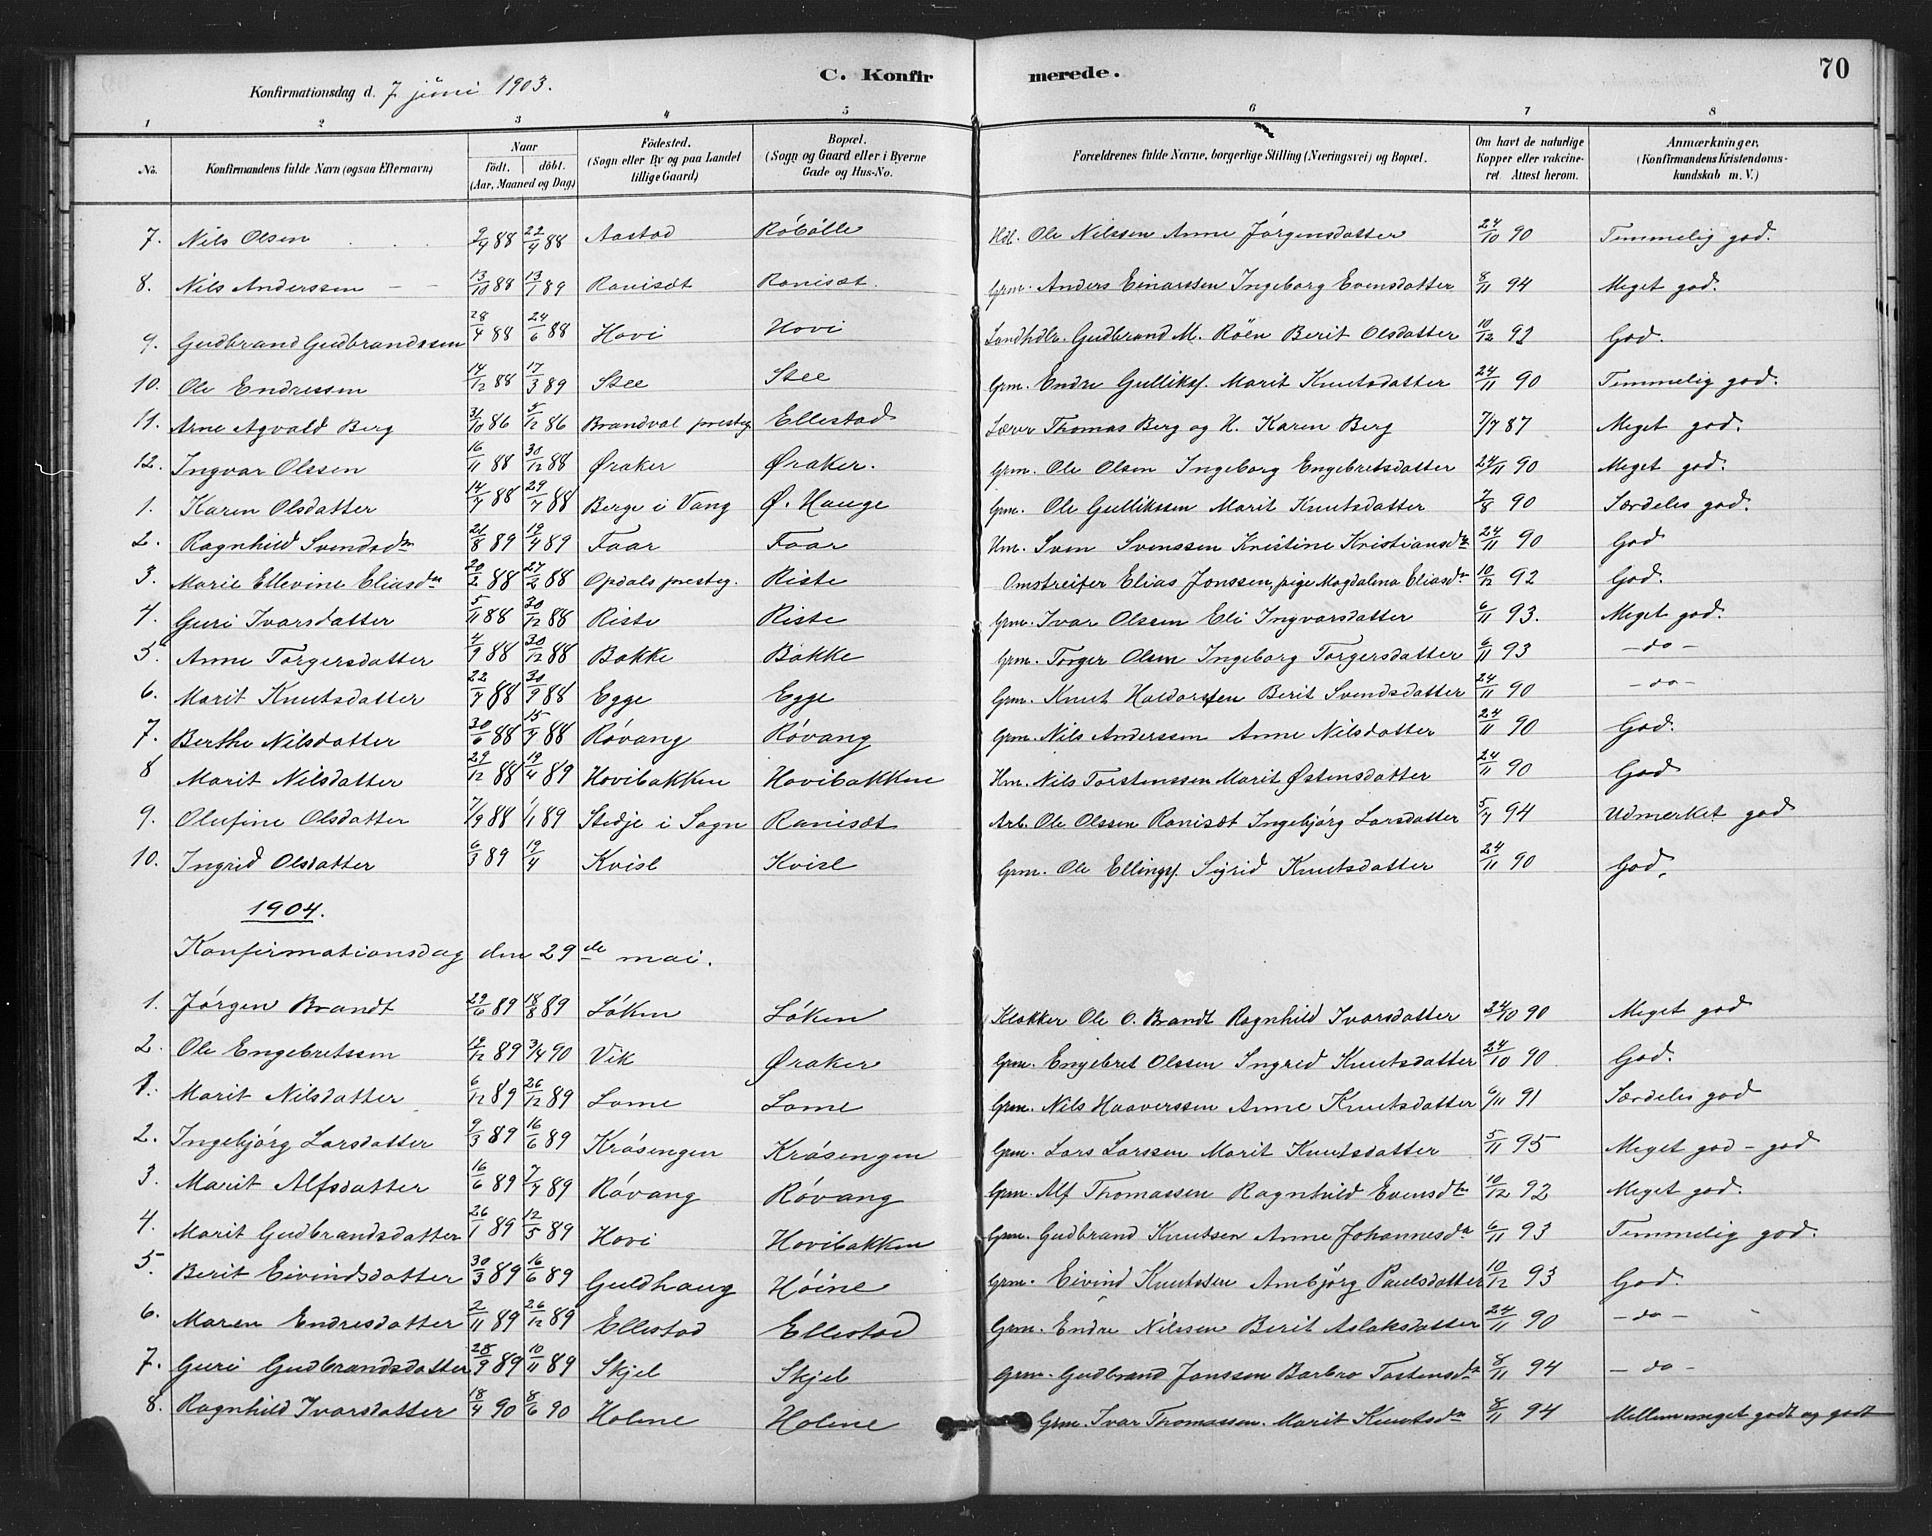 SAH, Vestre Slidre prestekontor, Klokkerbok nr. 6, 1881-1915, s. 70